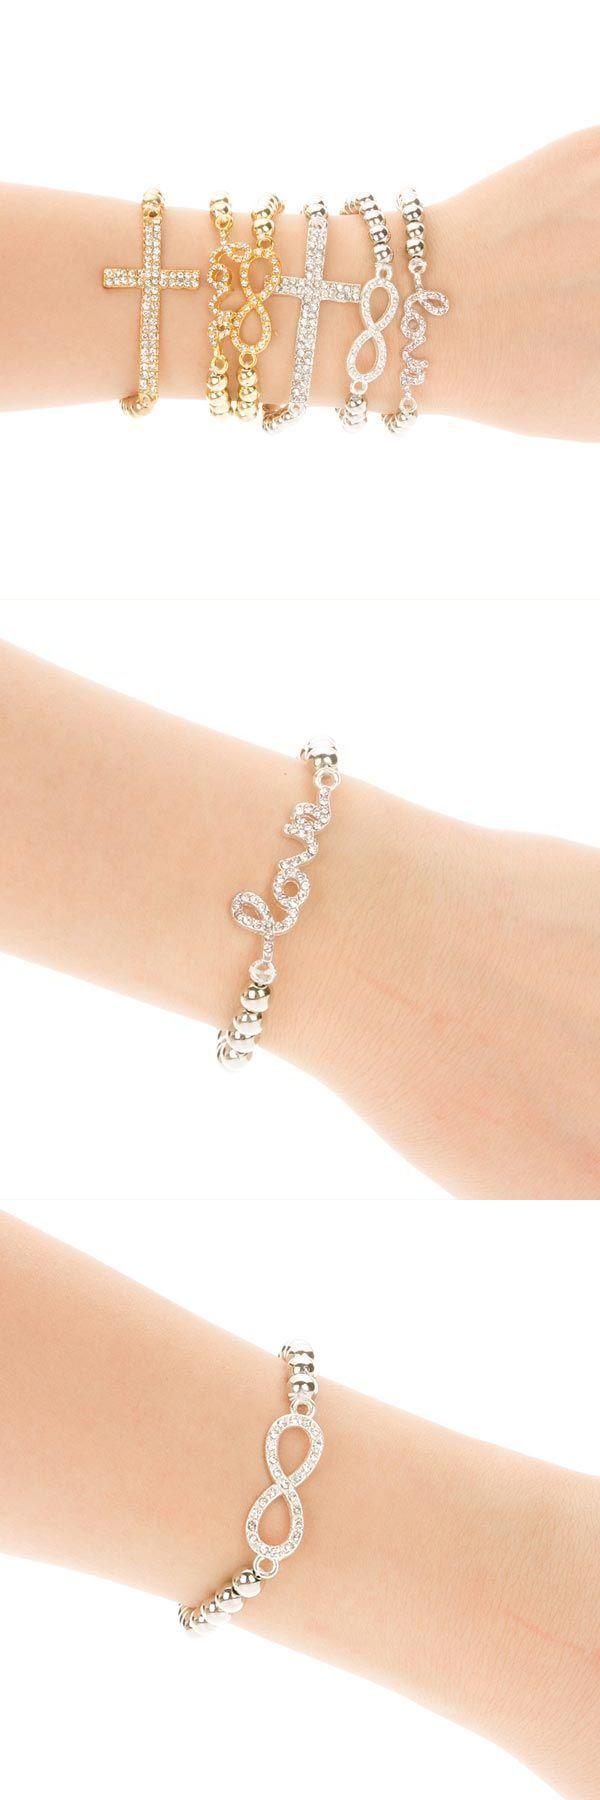 Elastic Rhinestone Bead Love Infinity Cross Bracelet Silver Gold Bracelets Vine 2 Together 99p Mattyb